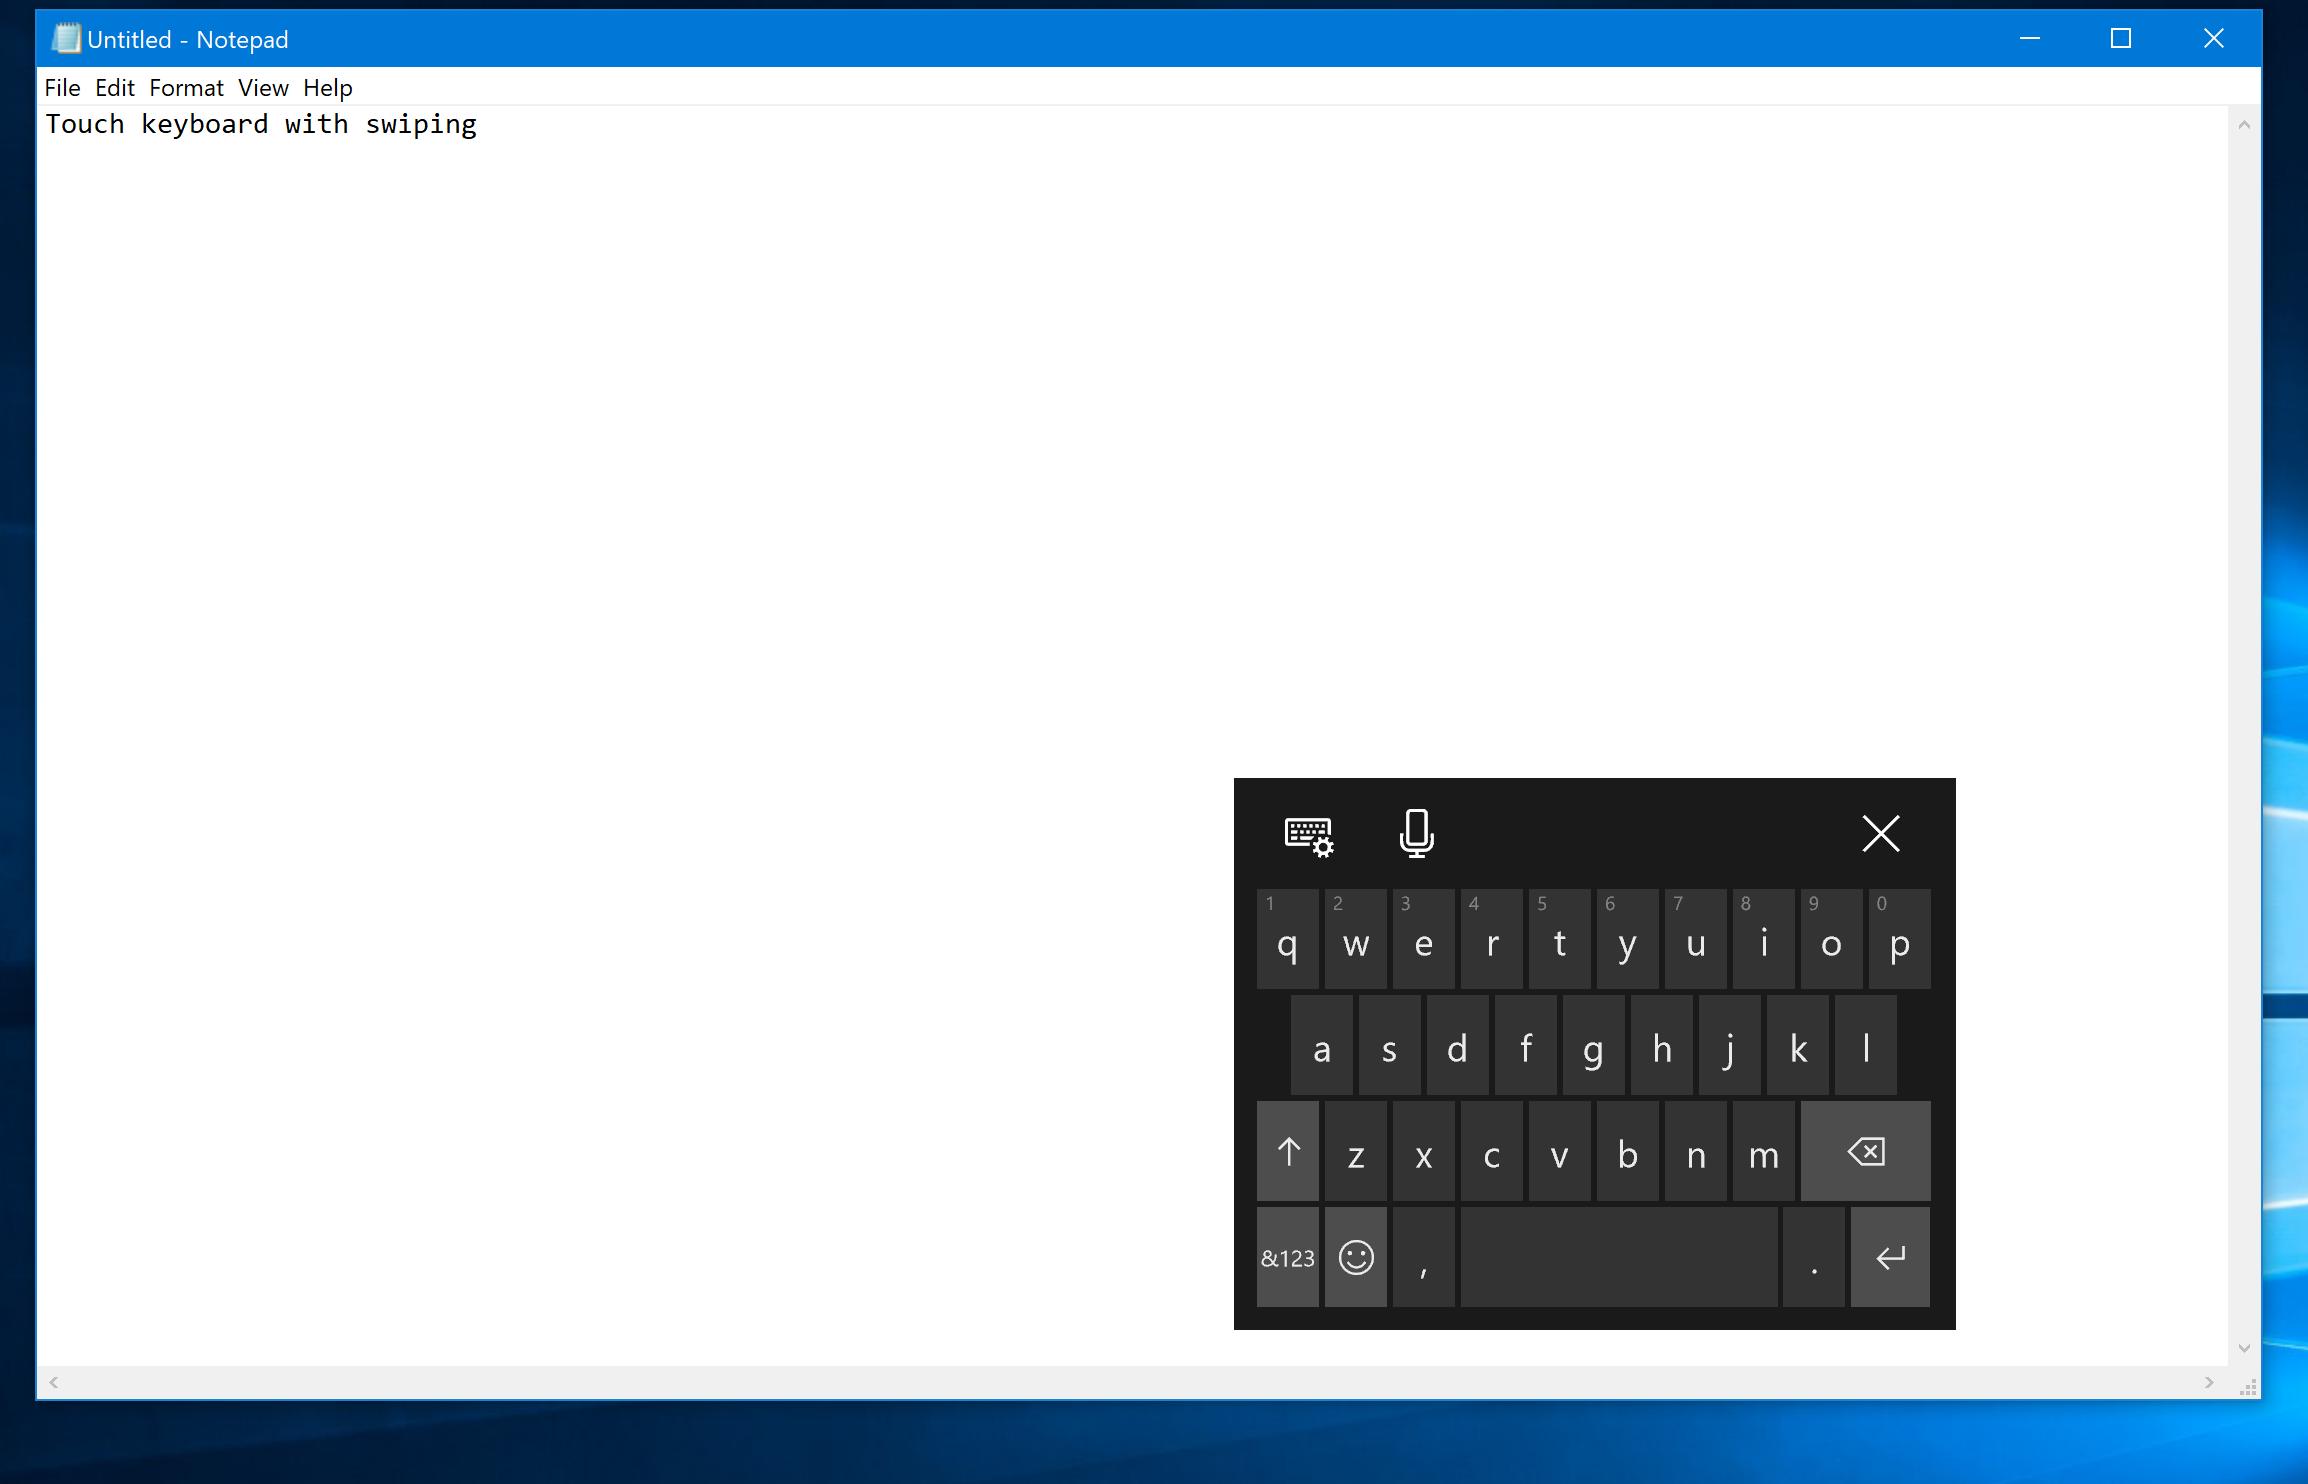 Windows 10 Fall Creators Update: Productivity | IT Pro